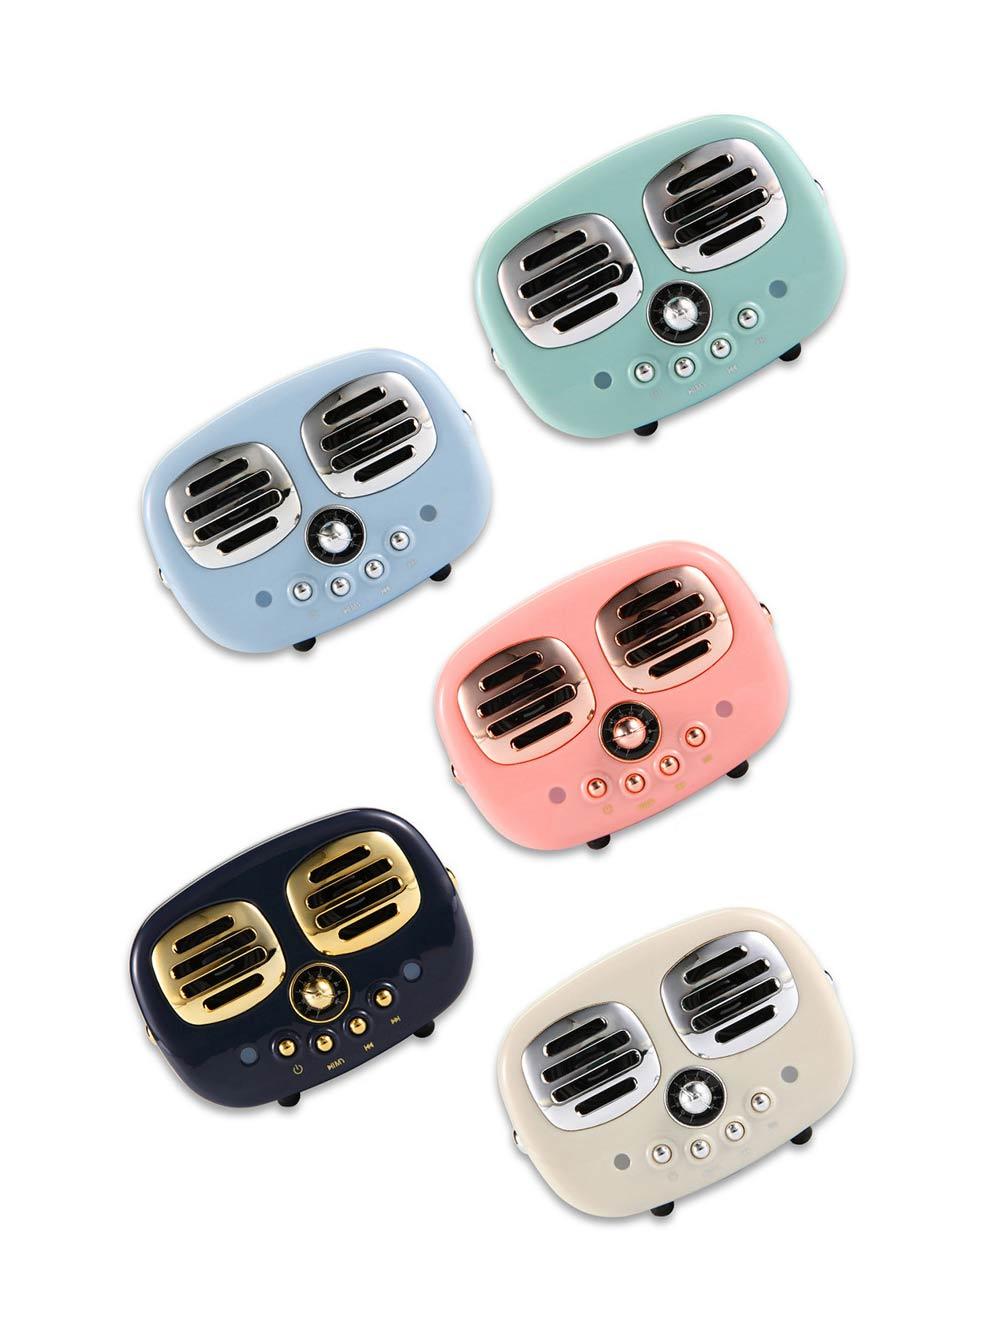 Creative Mini Portable Bluetooth Speaker With SD Card Slot, TF Card Insert Or USB Input 13